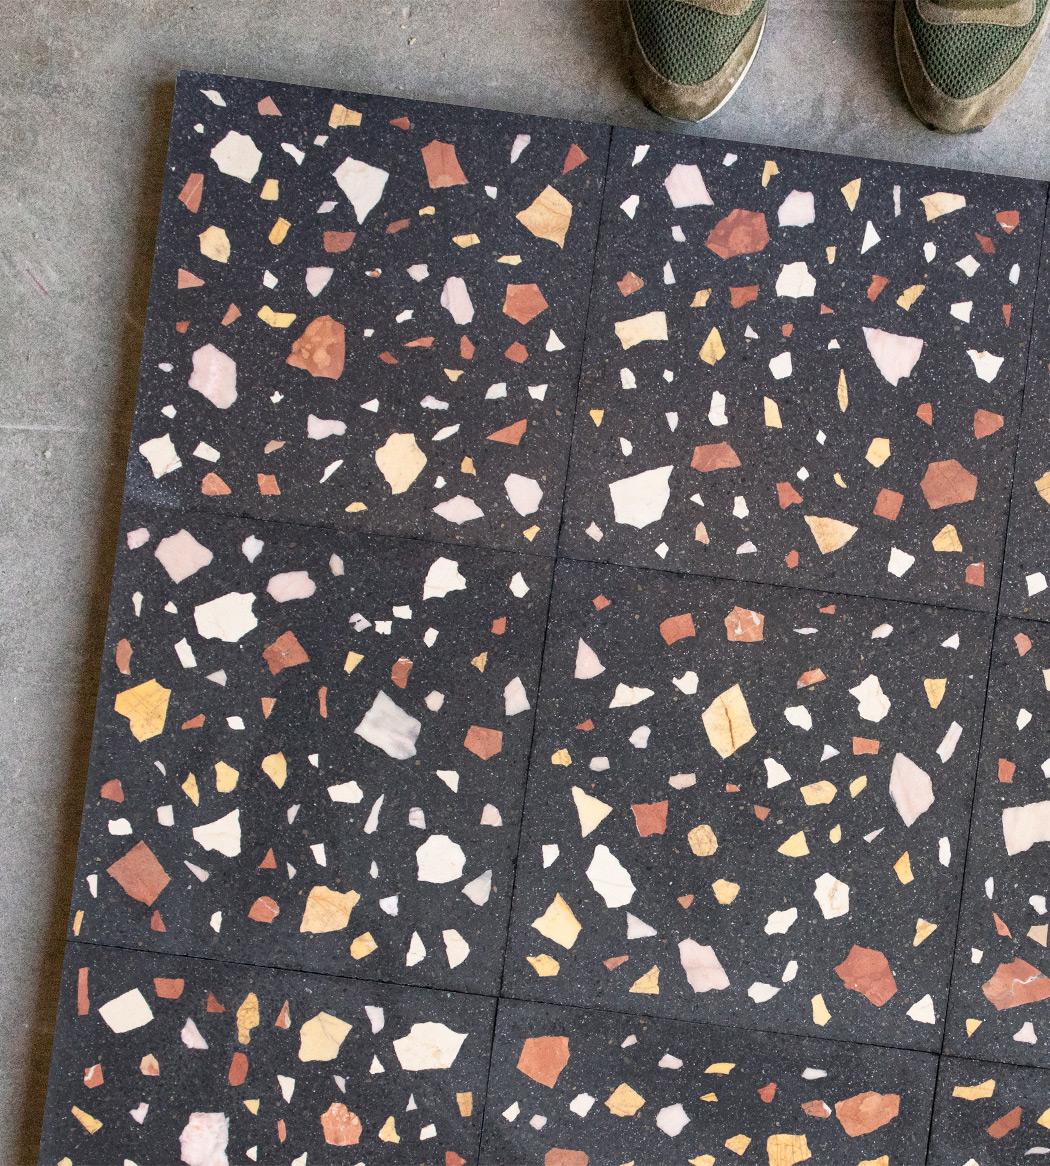 Terrazzo Wild small, 30x30 cm, black background